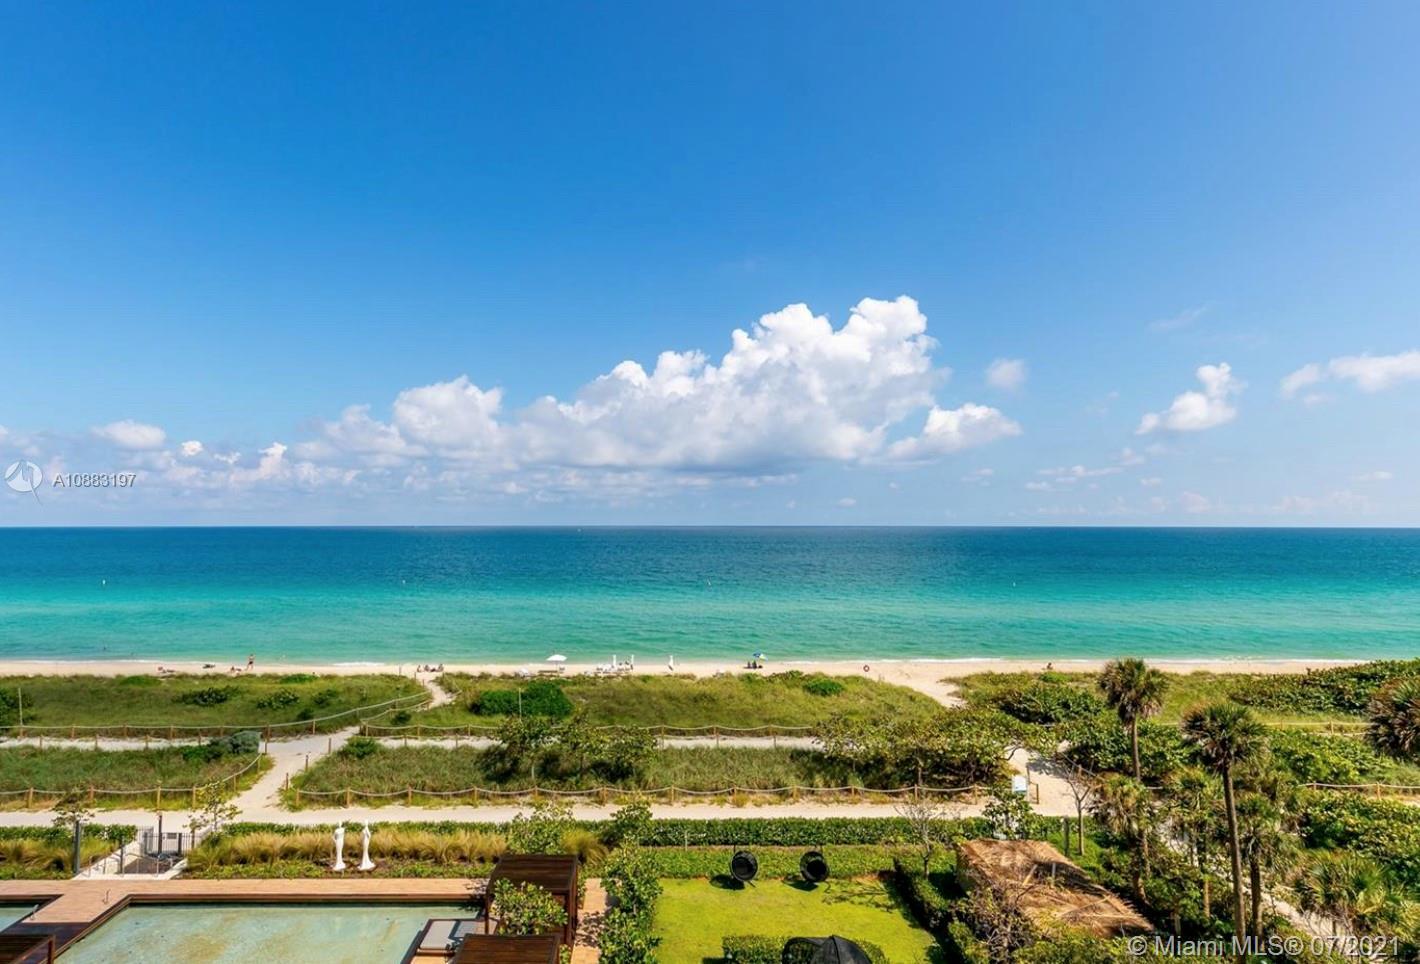 FENDI Chateau Residences, 9349 Collins Ave Unit 506, Surfside, Florida 33154, image 5